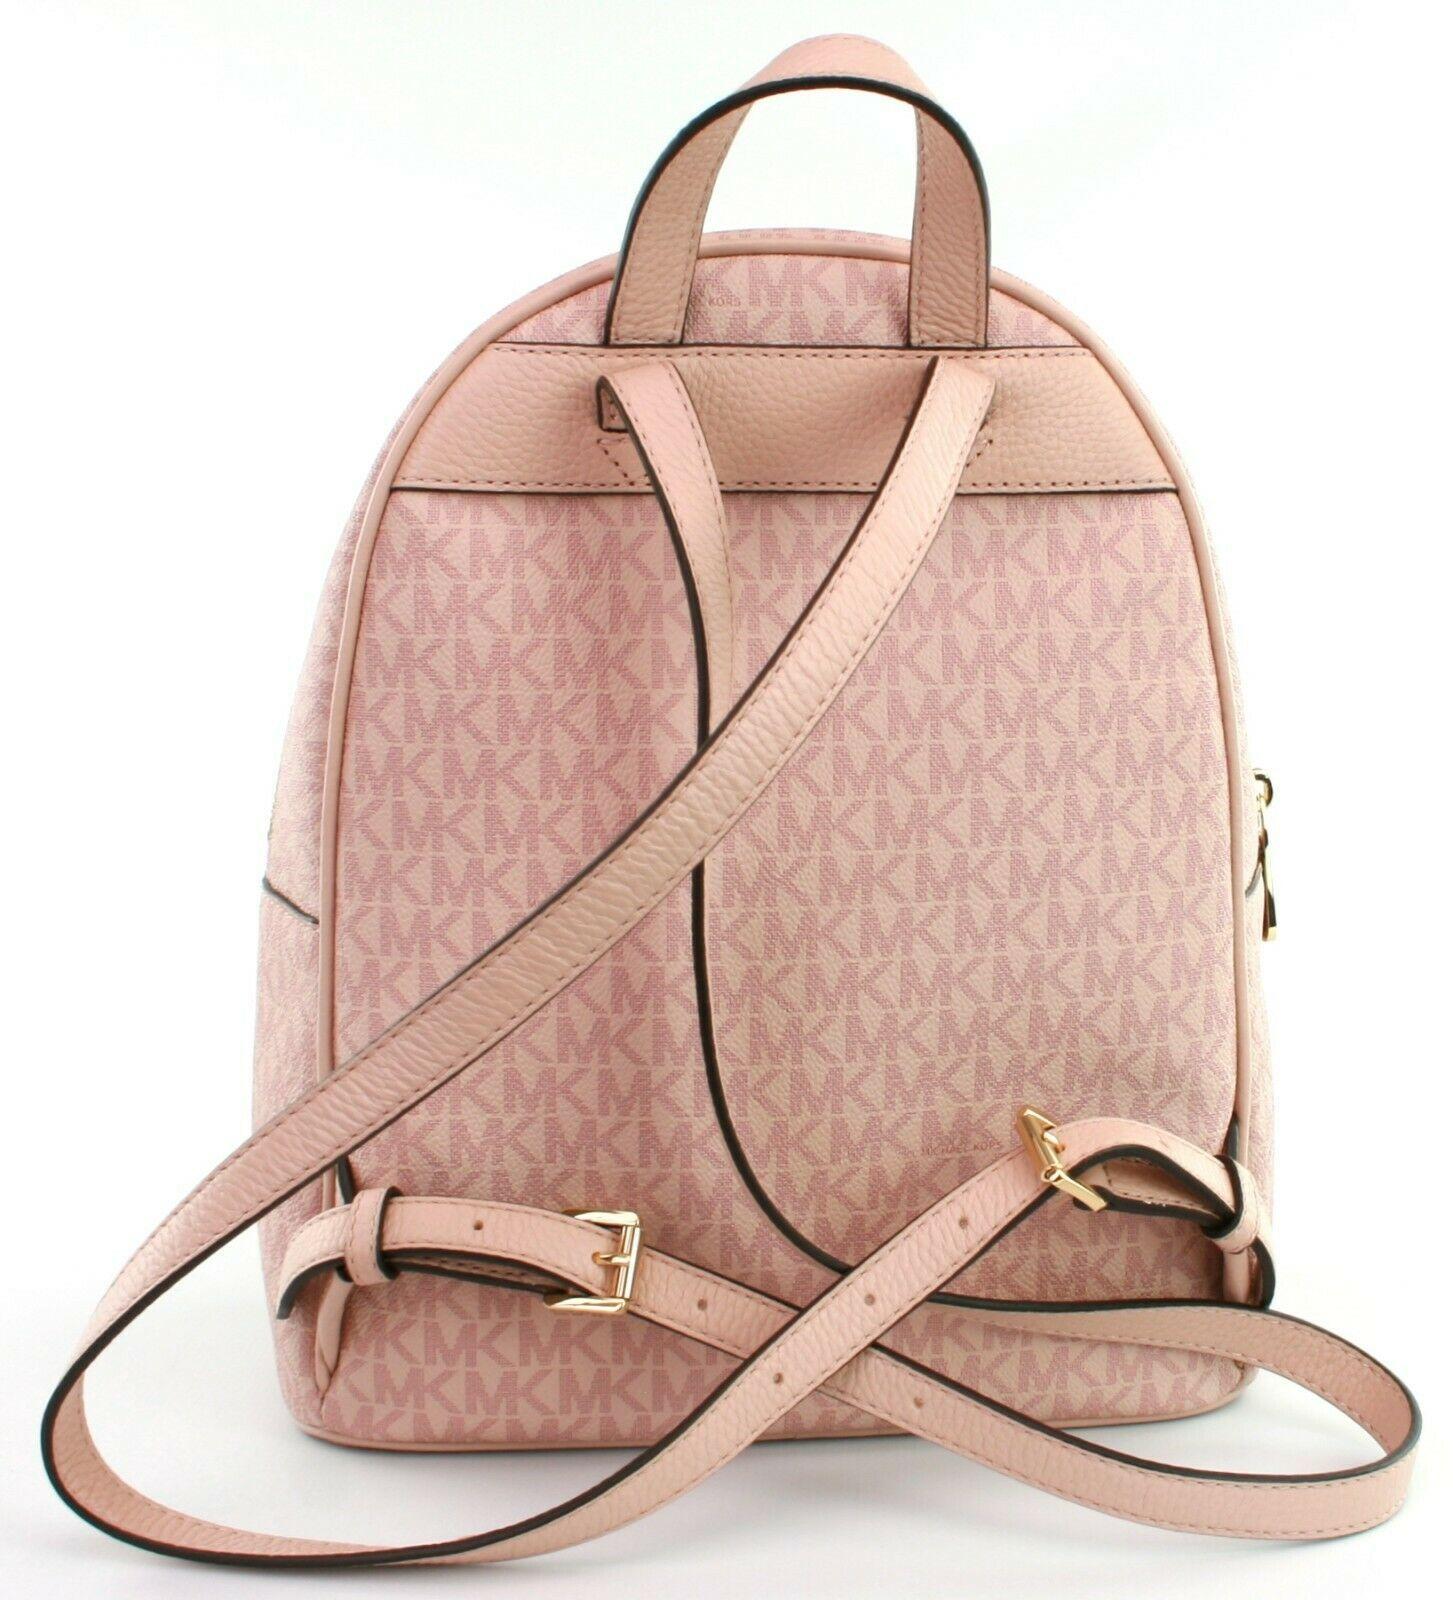 Michael Kors Abbey Monogrammed PVC Medium Backpack Ballet Pink RRP £310